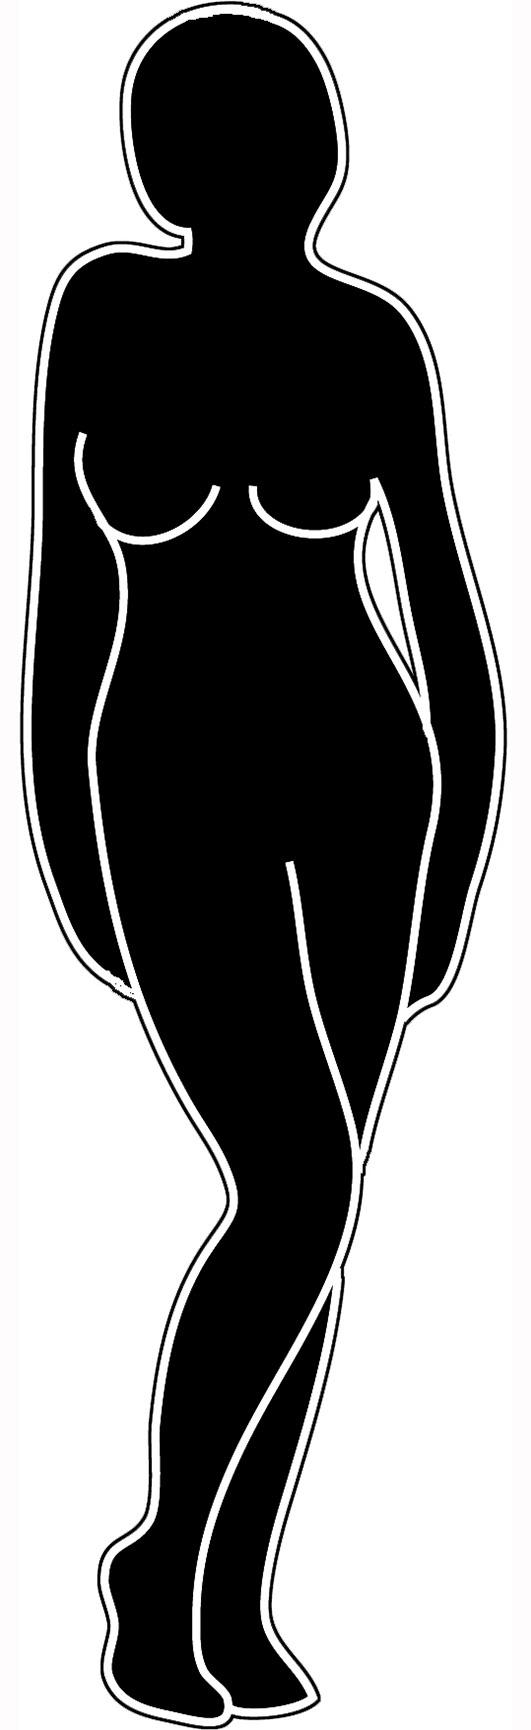 black white silhouette of female